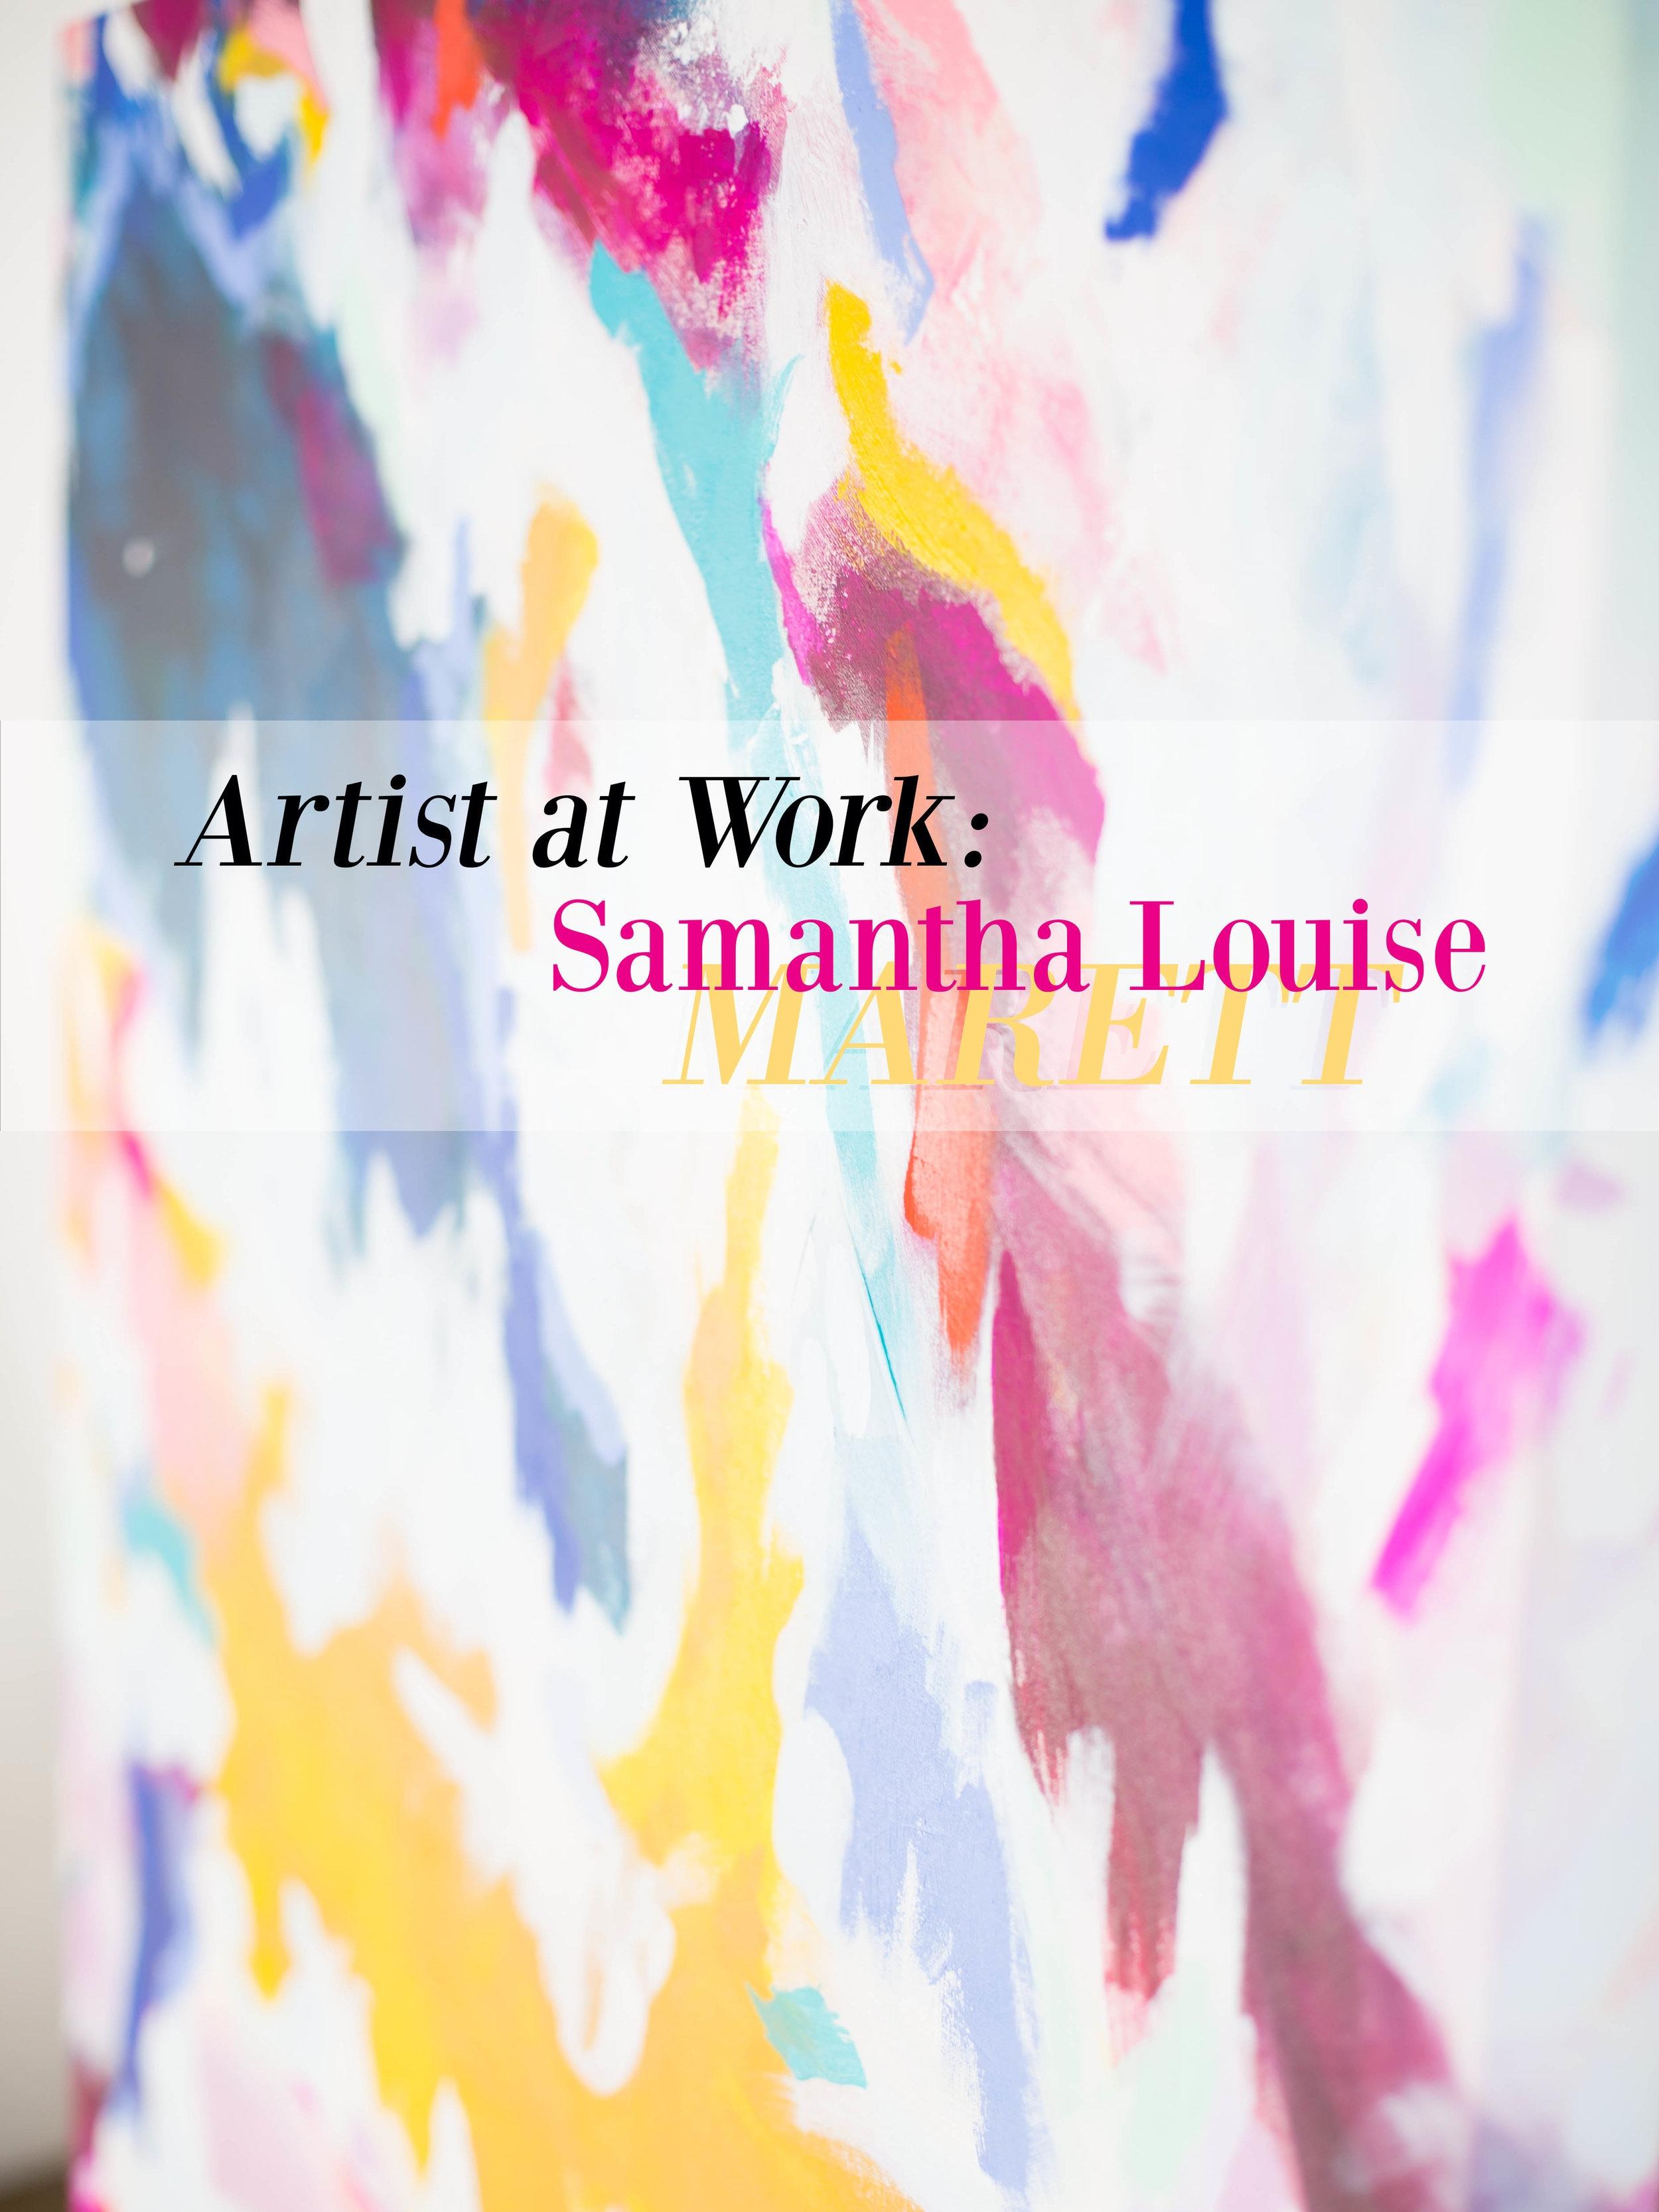 paint-brush-strokes-san-diego-branding-photographer-samantha-louise-marett-artist